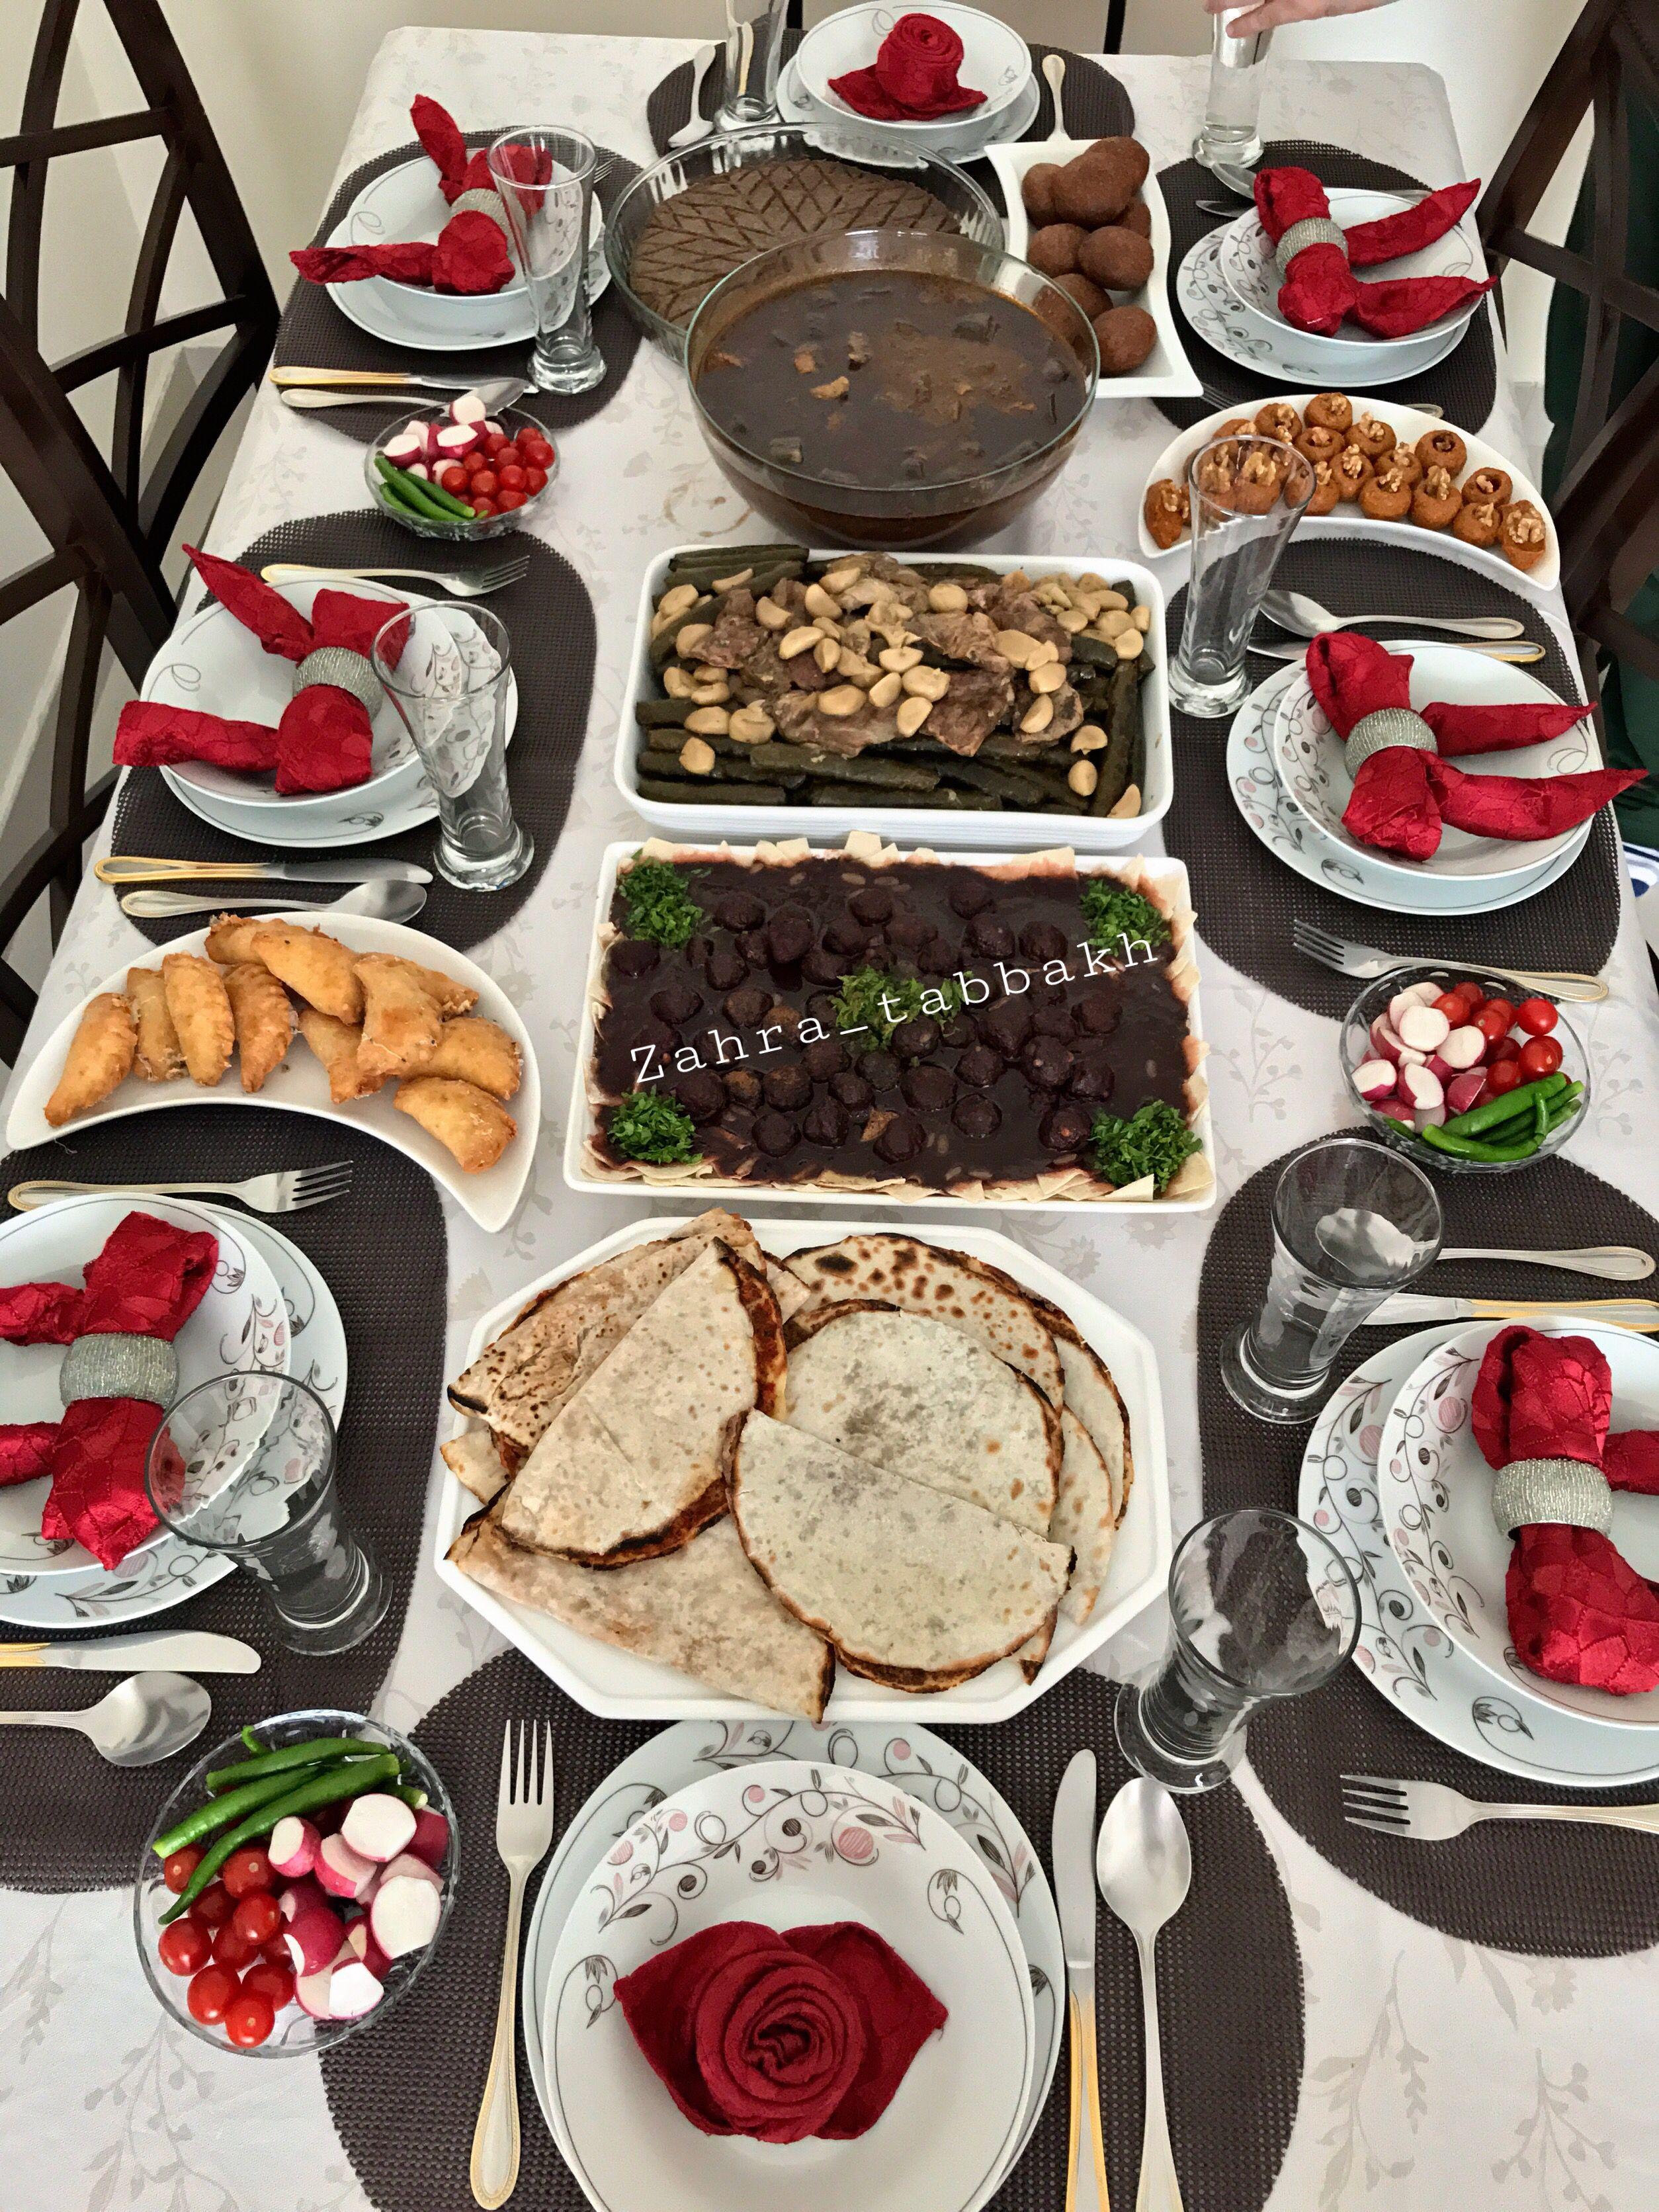 Homedecor ترتيب افكار ترتيب ترتيب طعام ديكور طاولات سفرة طعام أكلات طبخات تزيين طاولات تزيين Tablesettings Food Fooddesign Decor Desserts حلويات